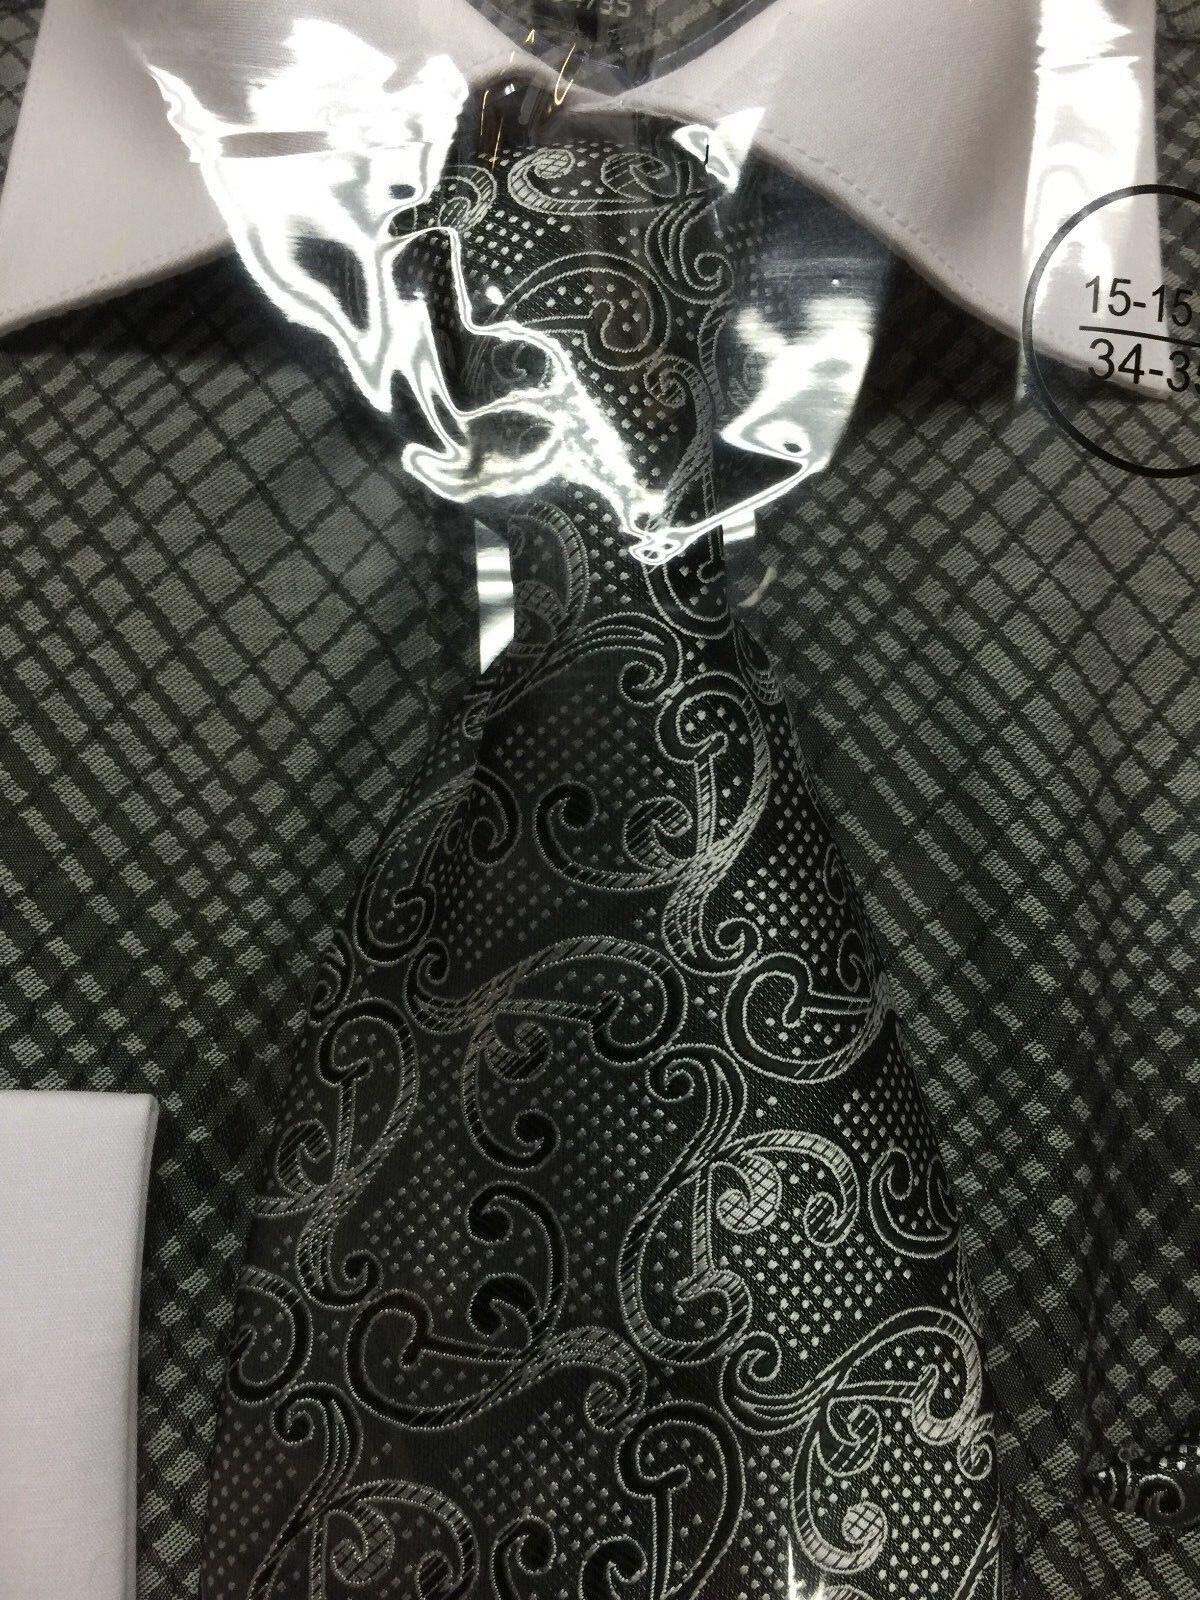 New mini plaid check design dress shirt french cuff white for Small collar dress shirt